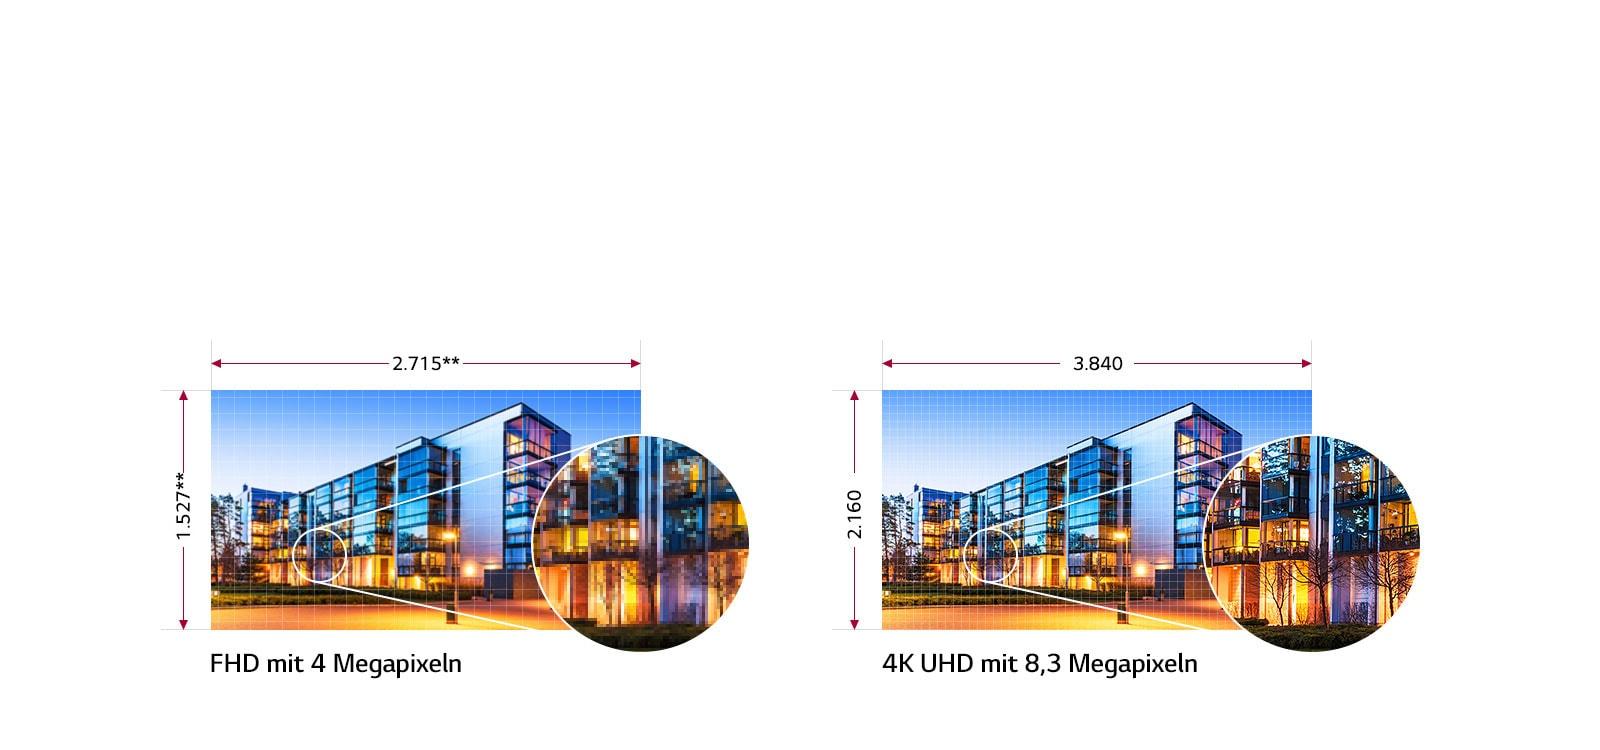 4K UHD mit 8,3 Megapixeln1